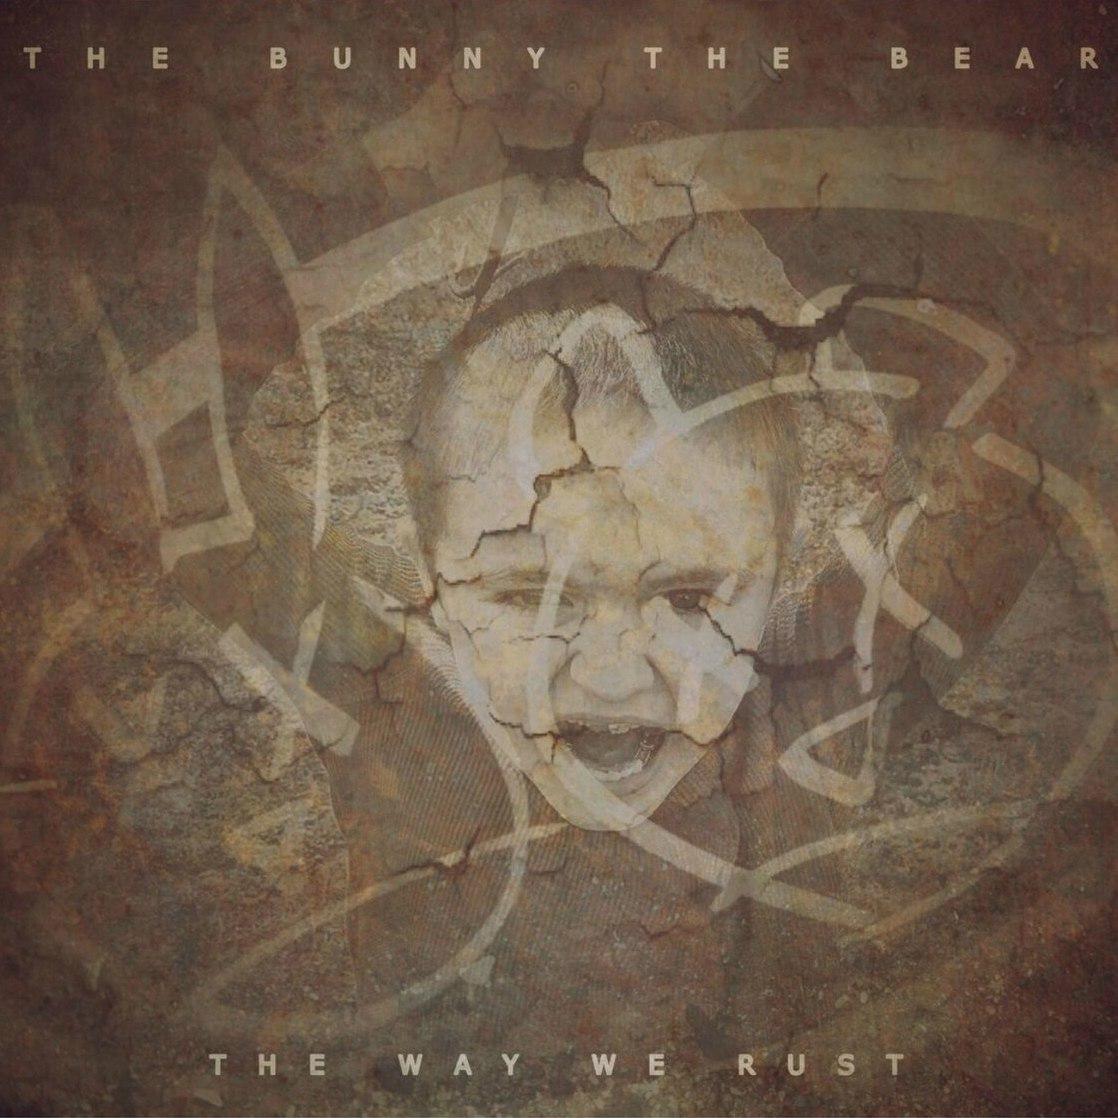 The Bunny The Bear - Love Lies [single] (2017)